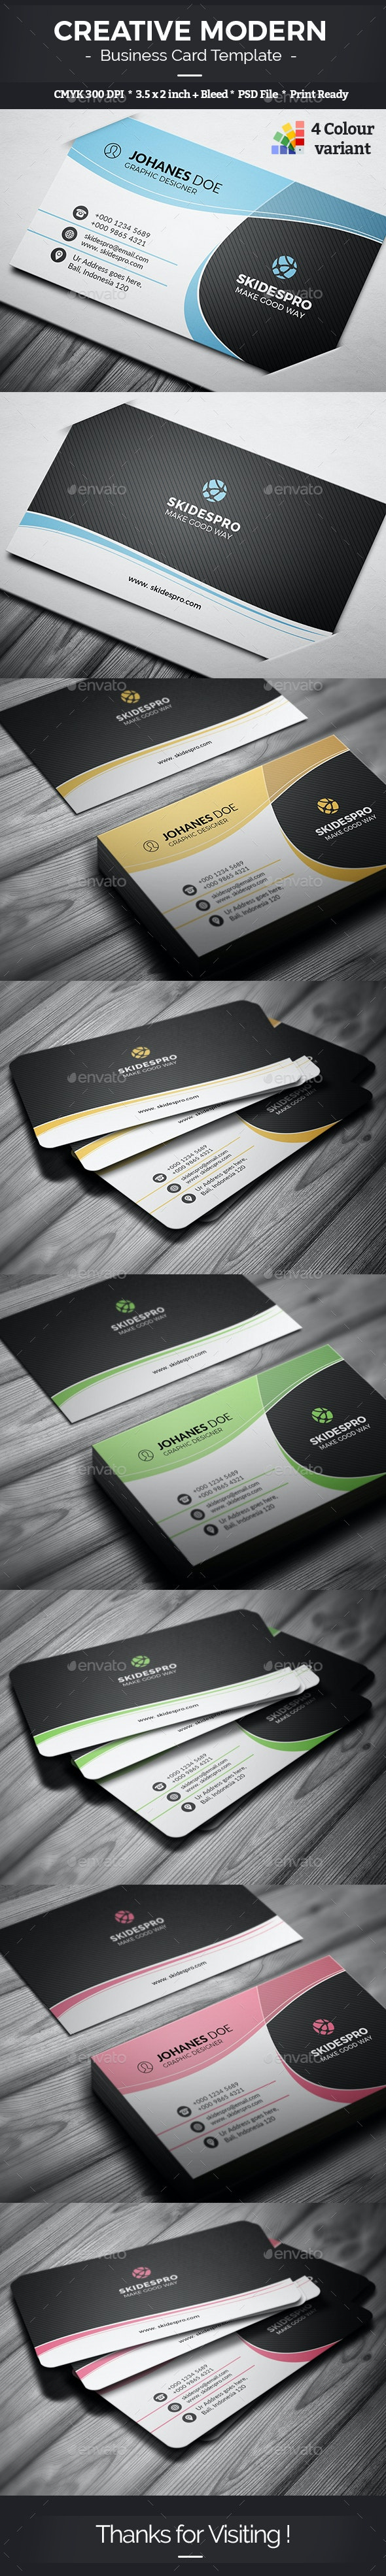 Creative Modern Business Card Template - Creative Business Cards